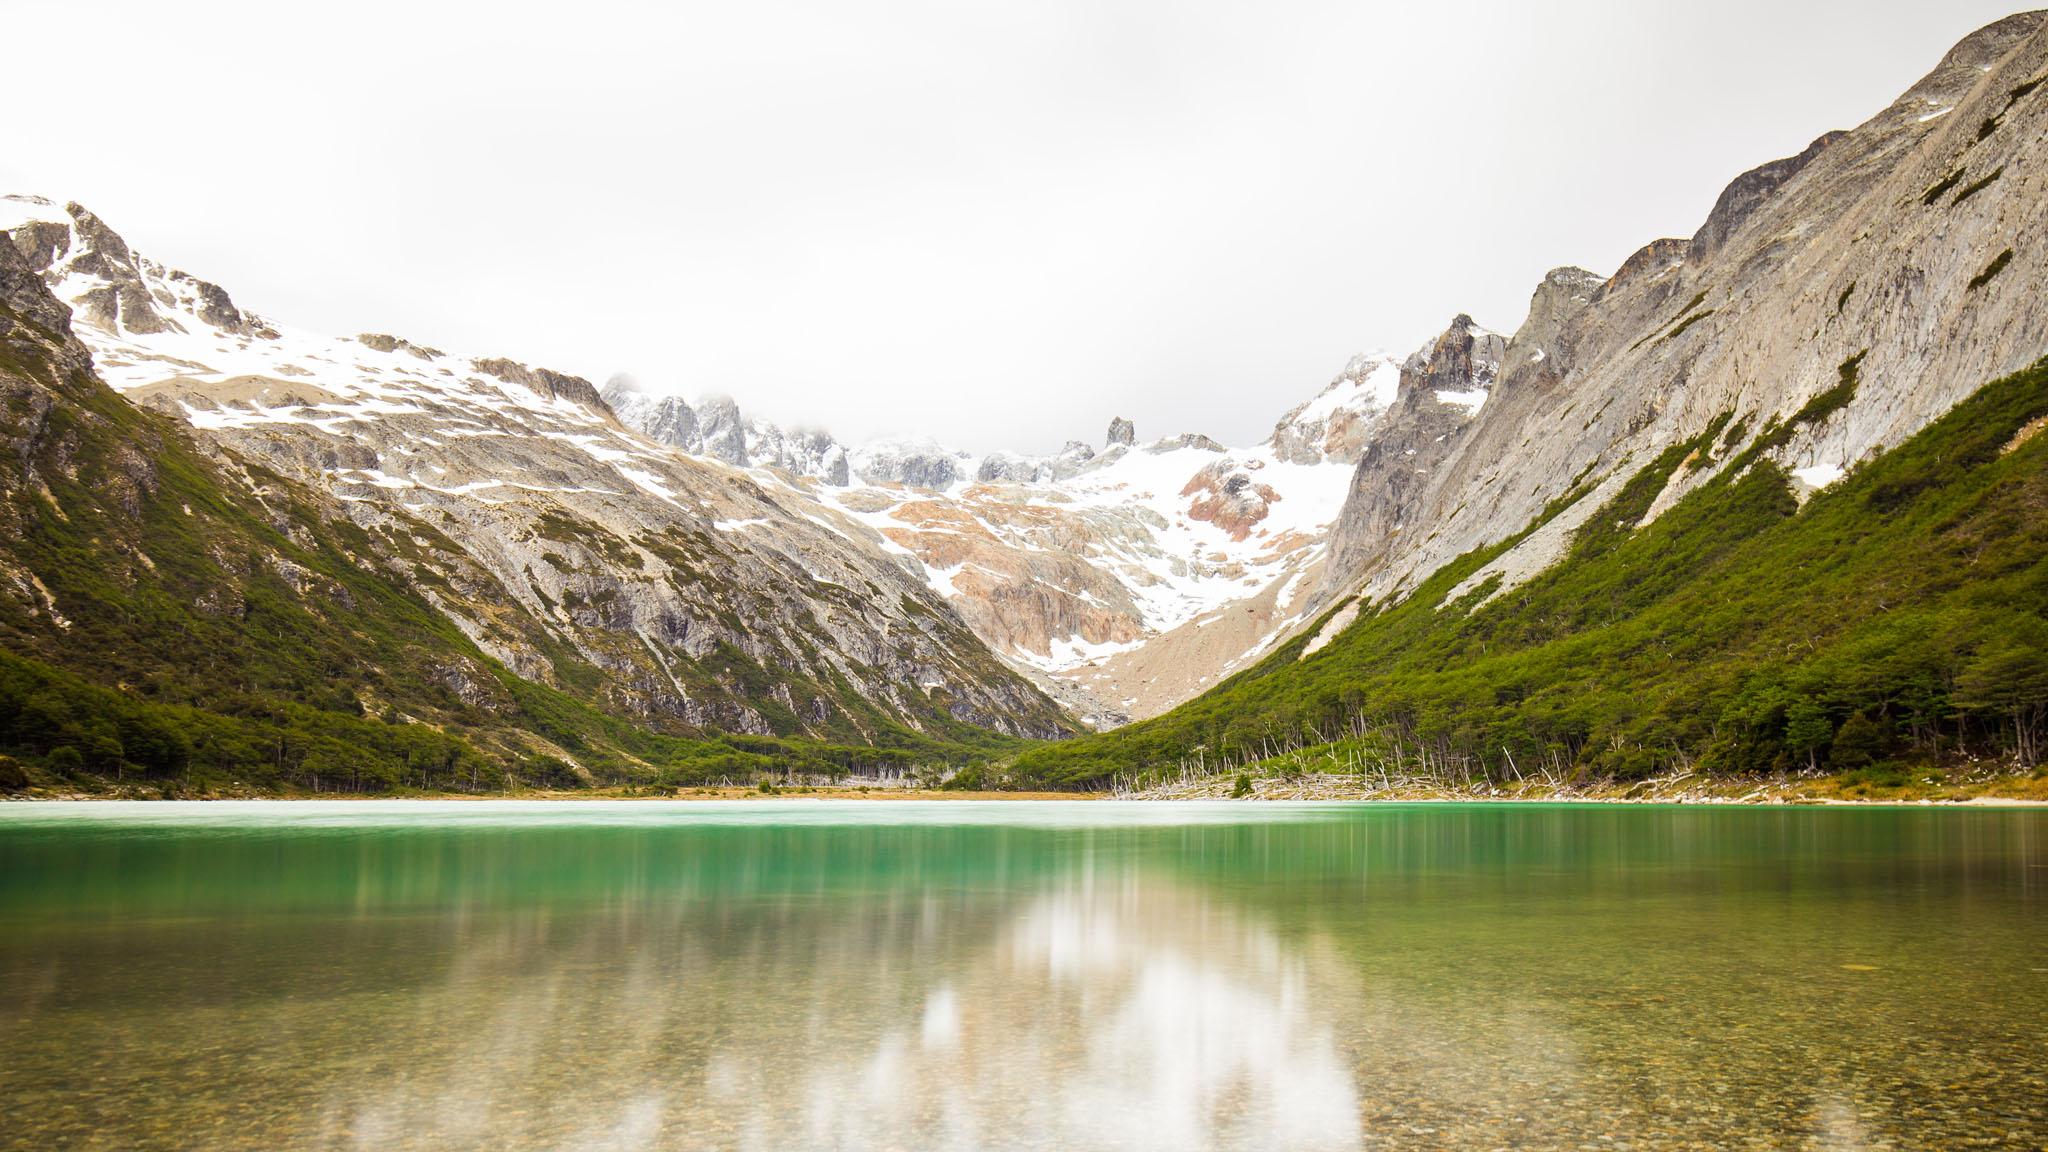 Wedding-travellers-ushuaia-argentina-laguna-esmeralda-lake-emerald-mountains-snow